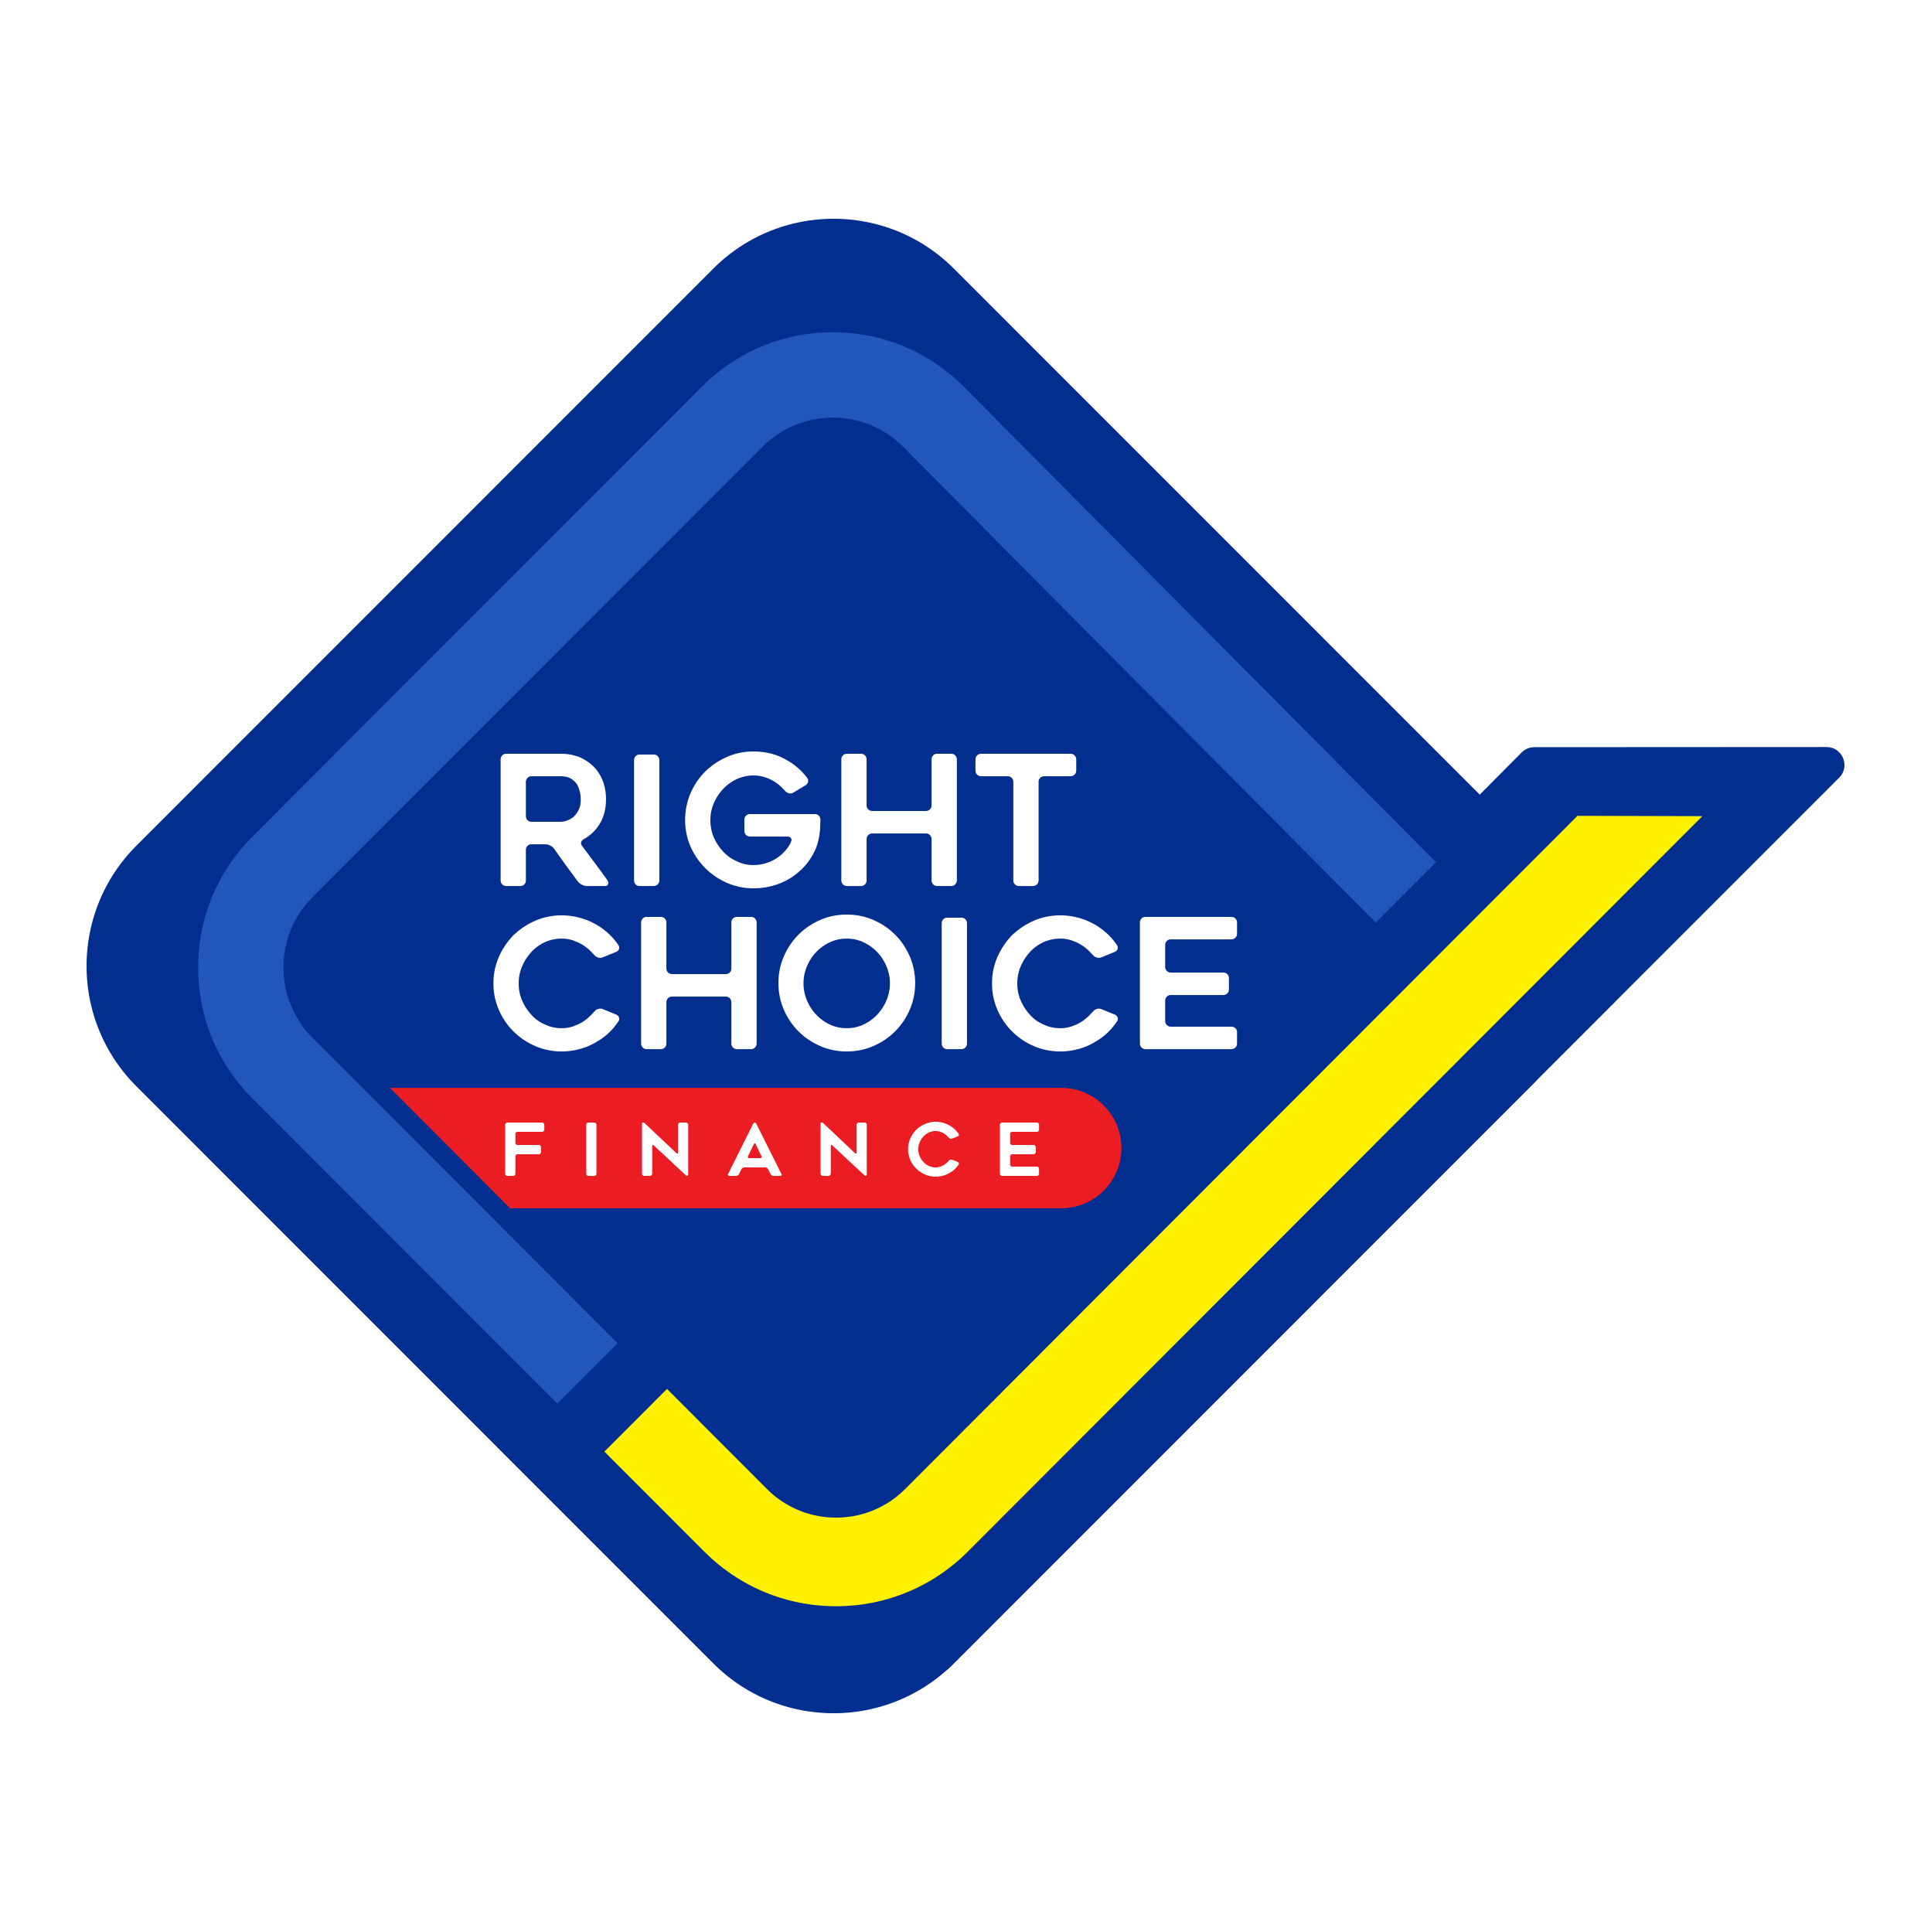 Right Choice Finance